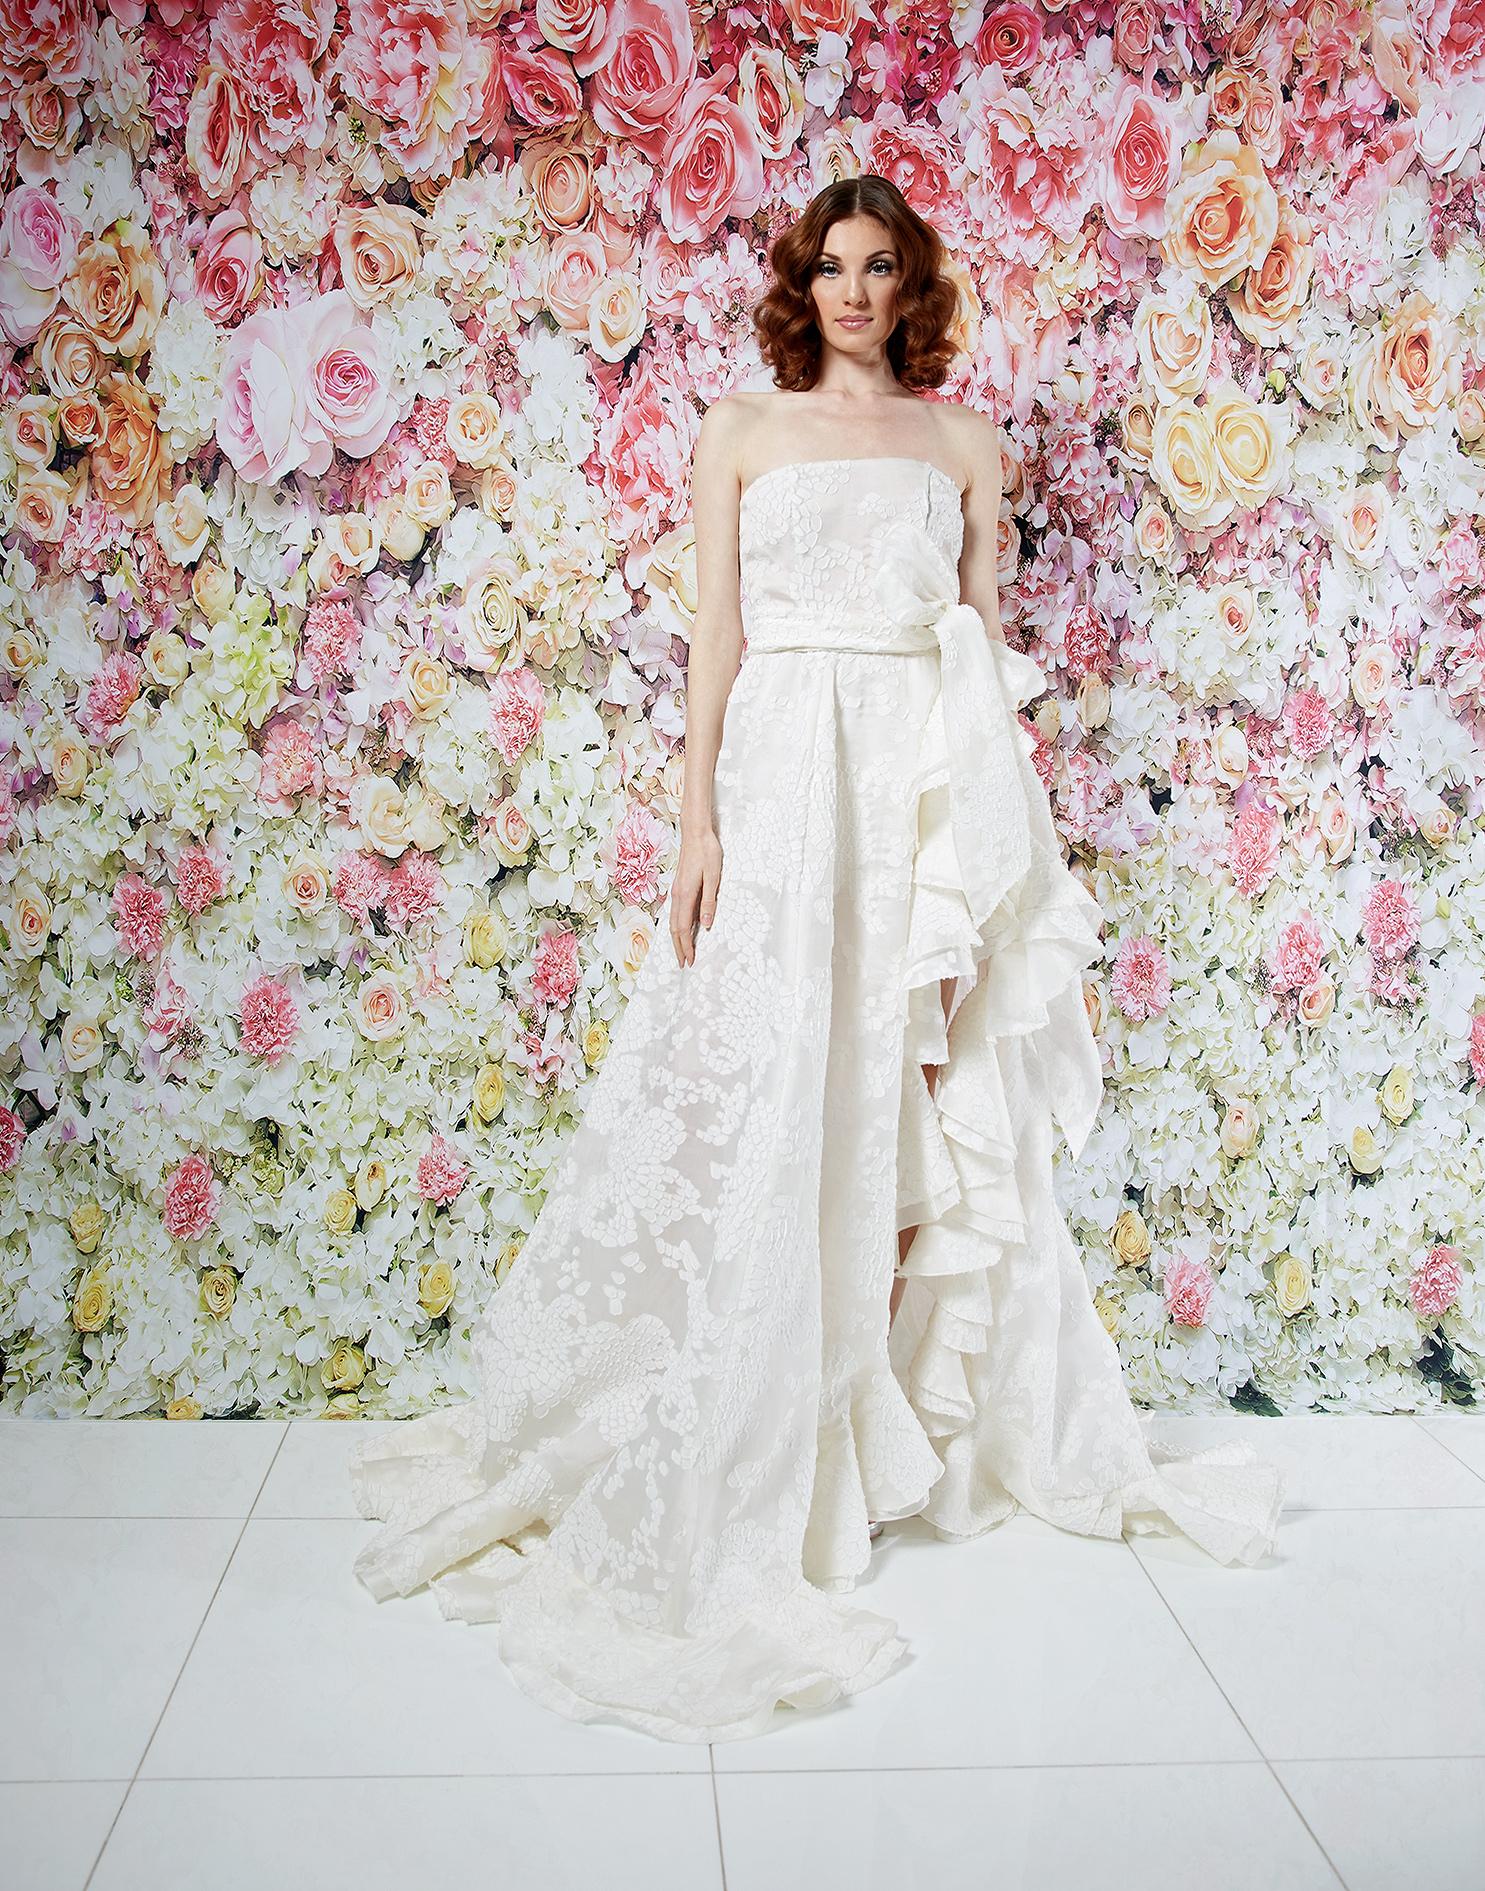 randi rahm wedding dress spring 2019 strapless a-line ruffle sash